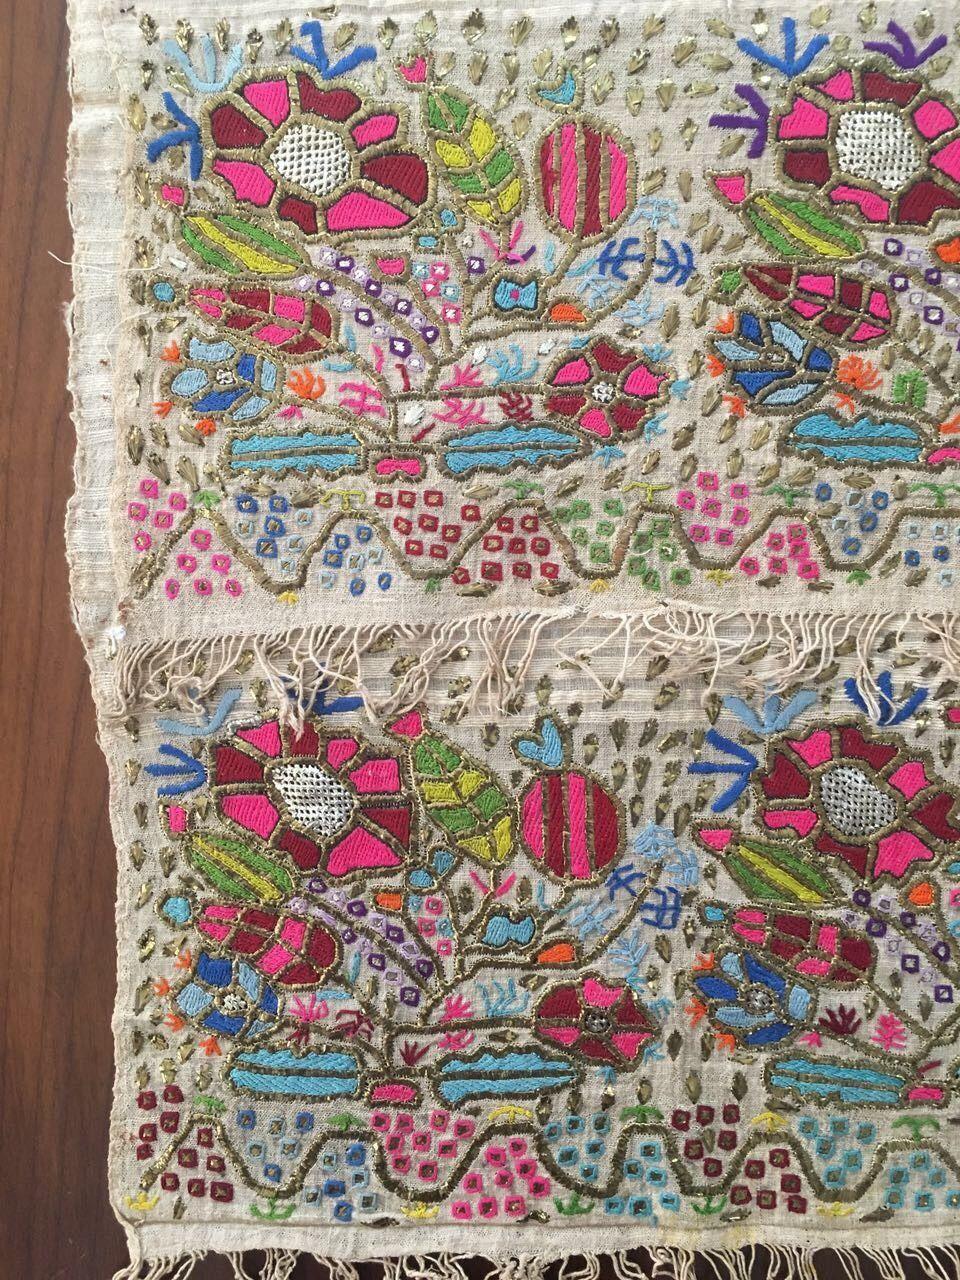 Antique Ottoman Turkish Silk Gold Metallic Hand Embroidery On